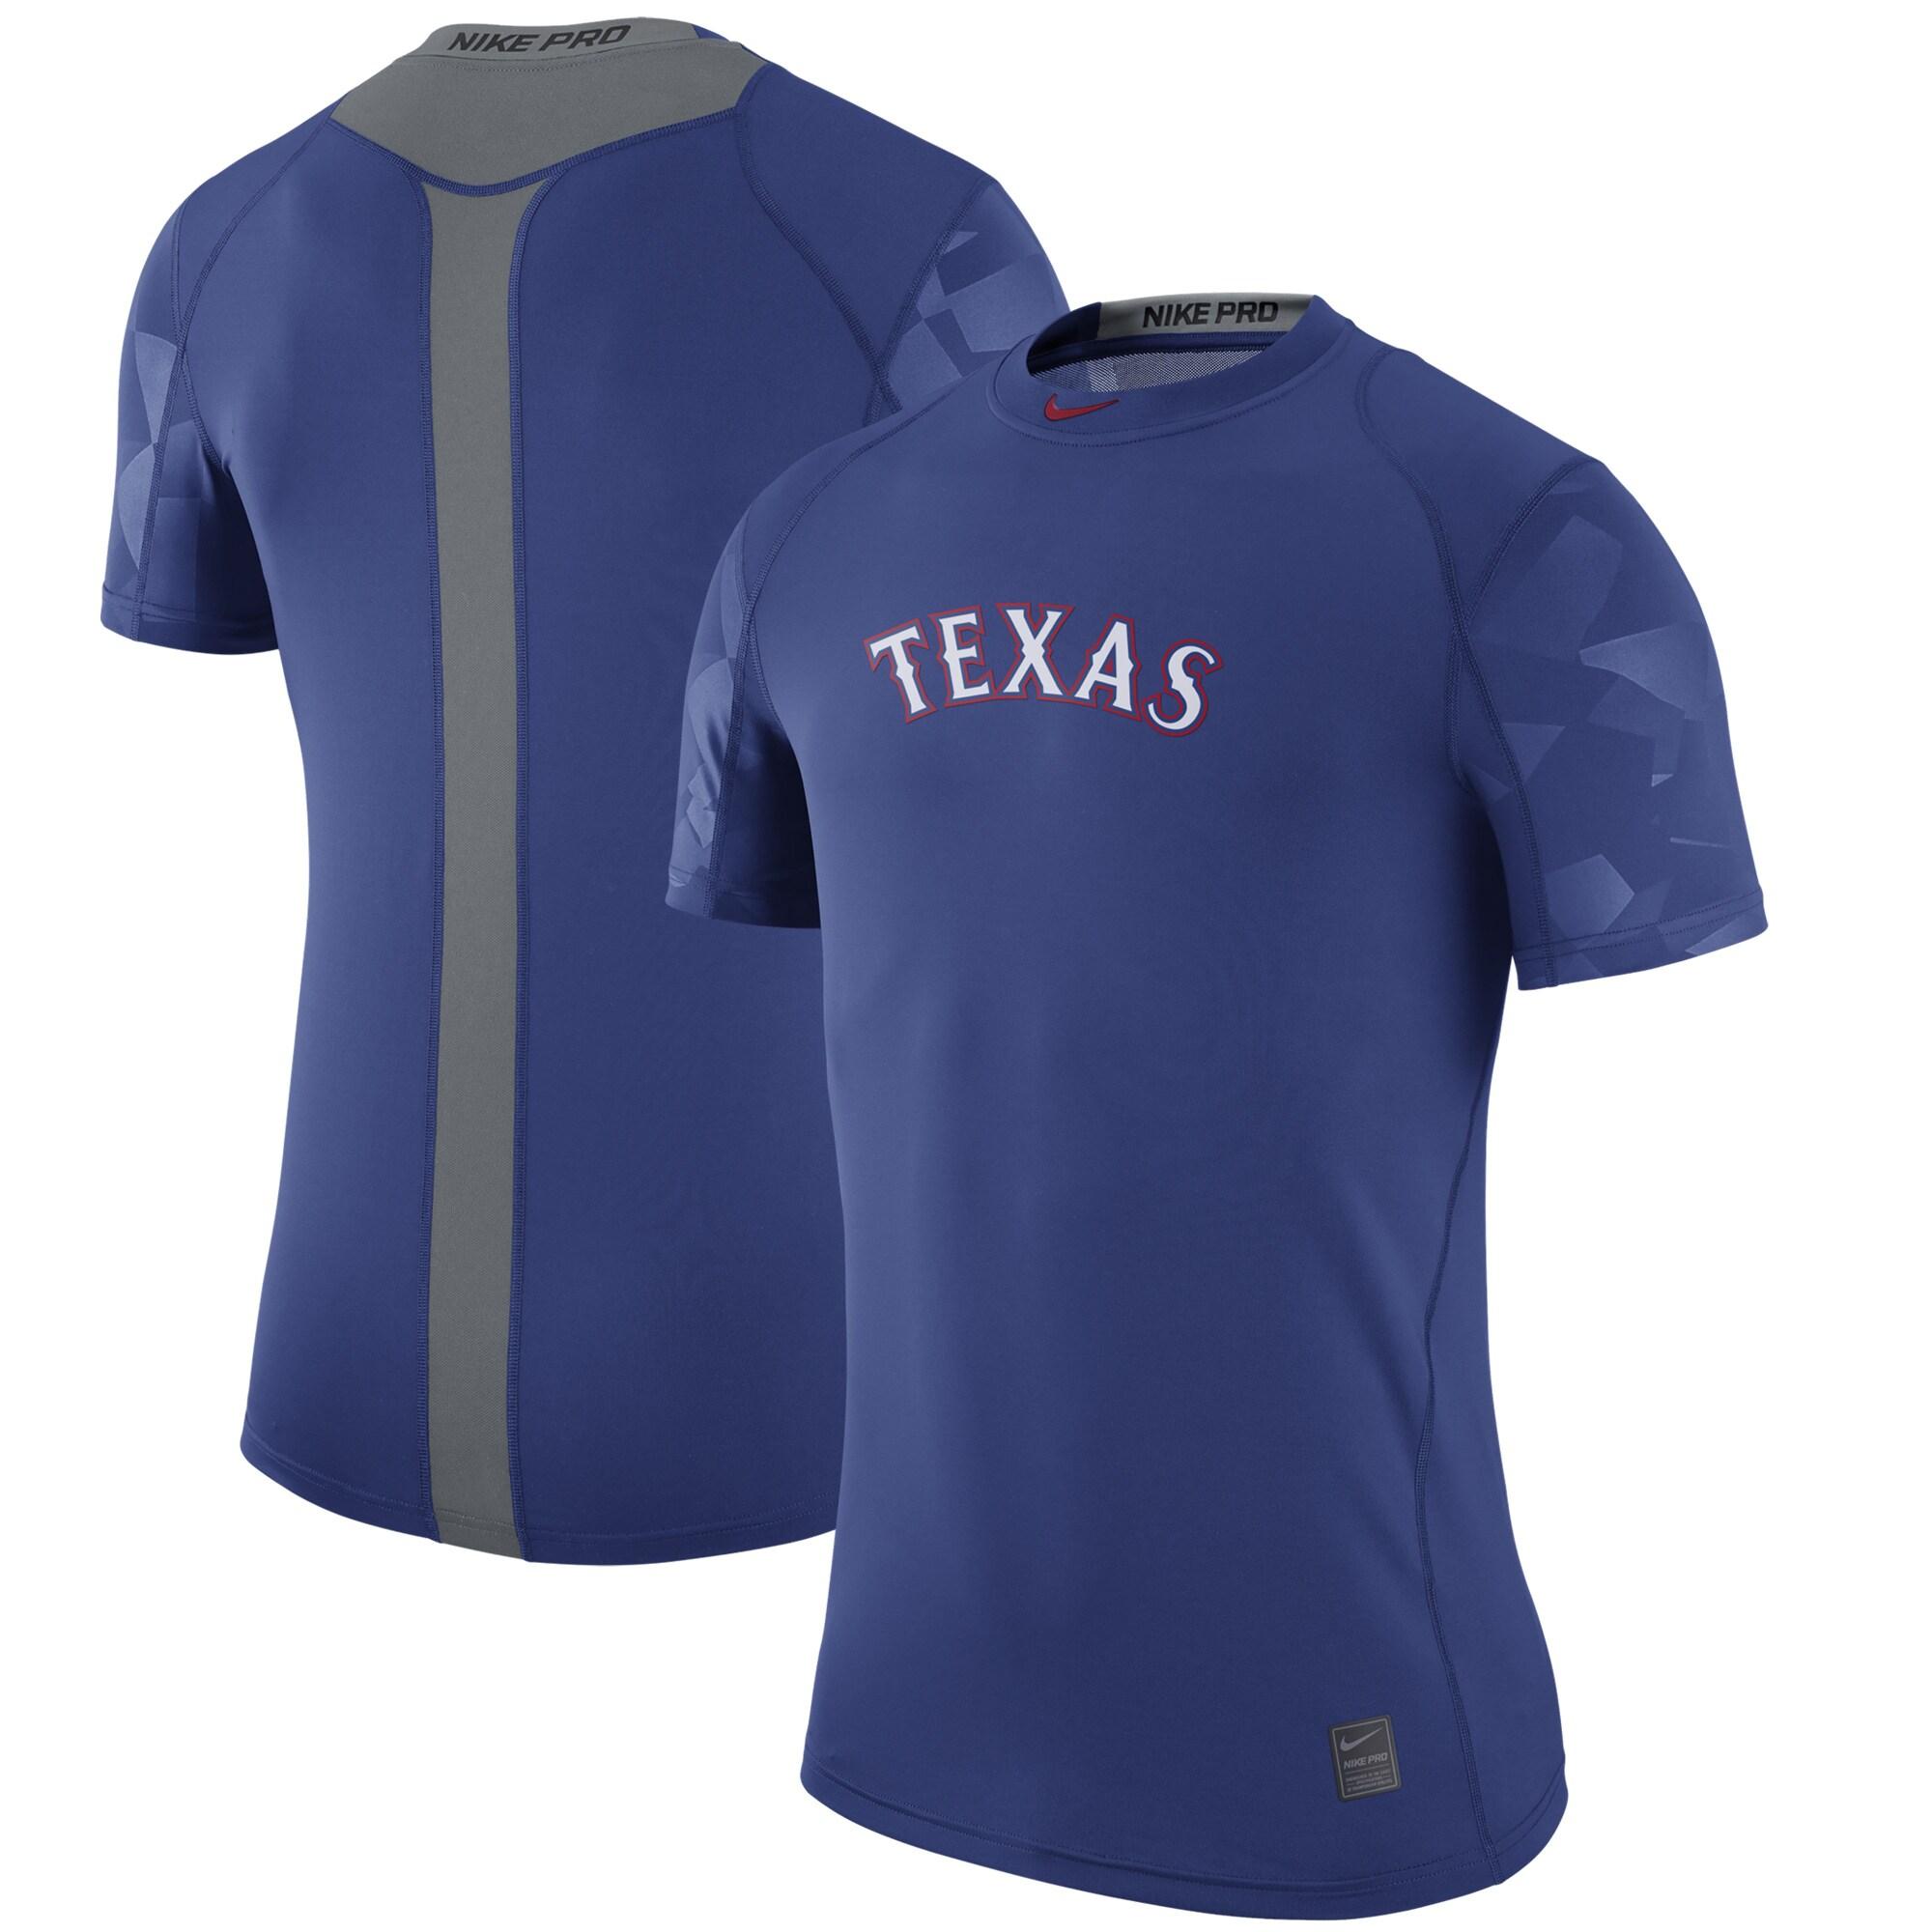 Texas Rangers Nike Pro Cool Performance T-Shirt - Royal